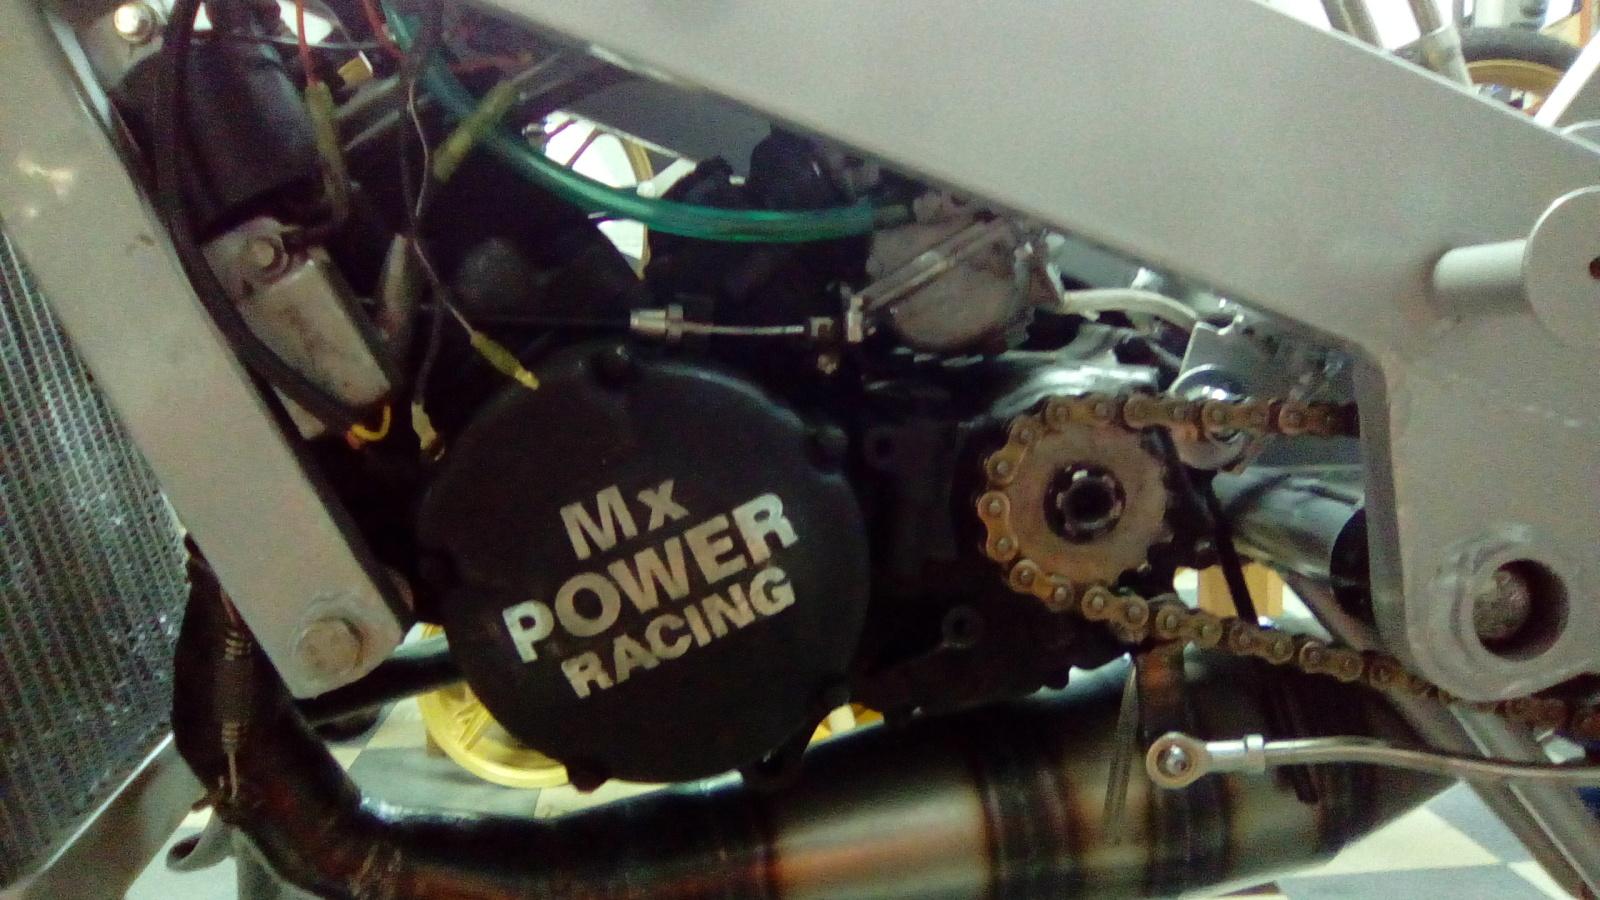 MH 003 JJ.COBAS Moto Hernan Sxkdhk